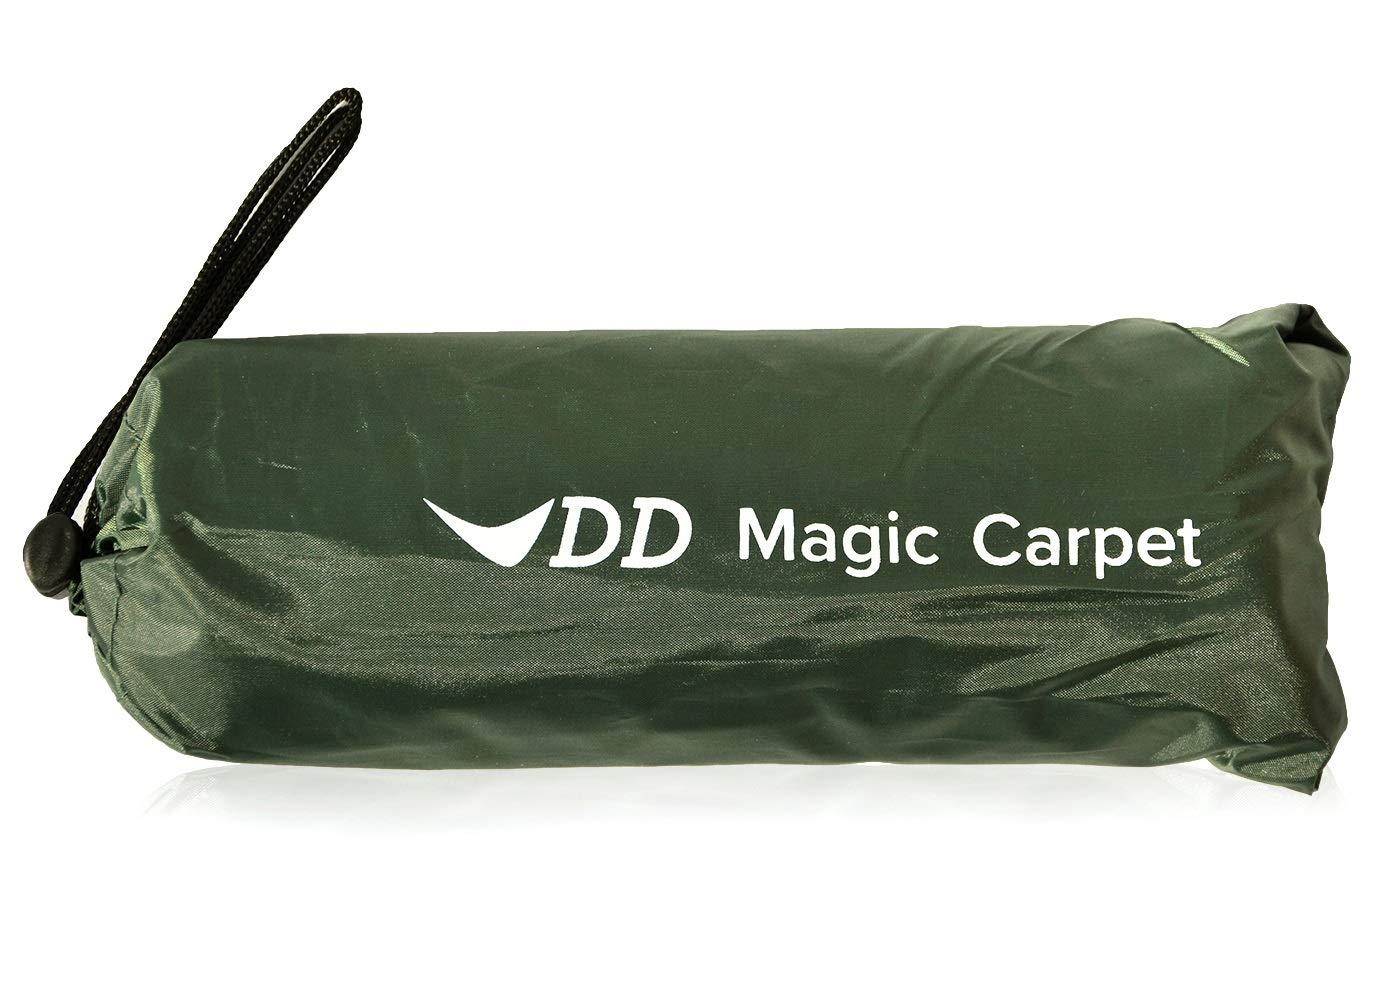 DD Magic Carpet **Ultralight Camping Shelter Ground Sheet Basha**